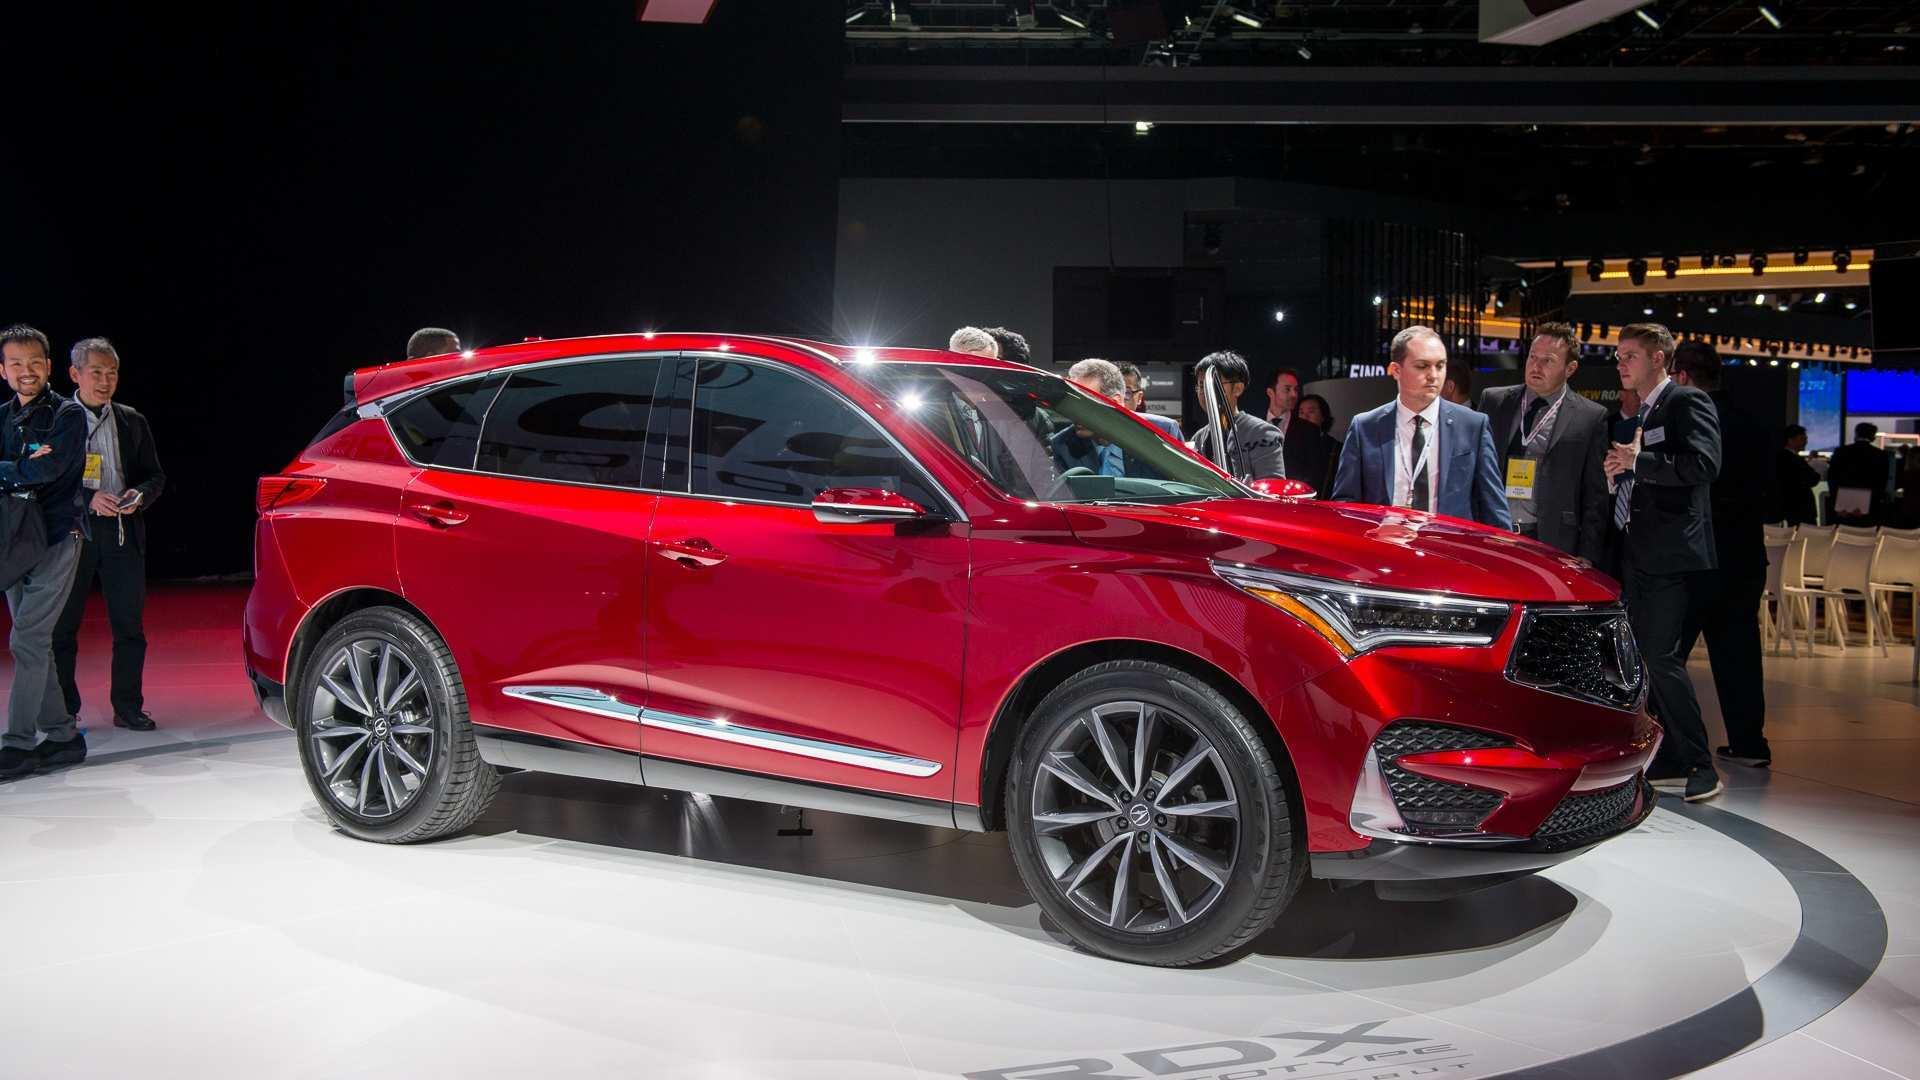 39 New New 2019 Acura Rdx Zero To 60 Spy Shoot Spesification by New 2019 Acura Rdx Zero To 60 Spy Shoot